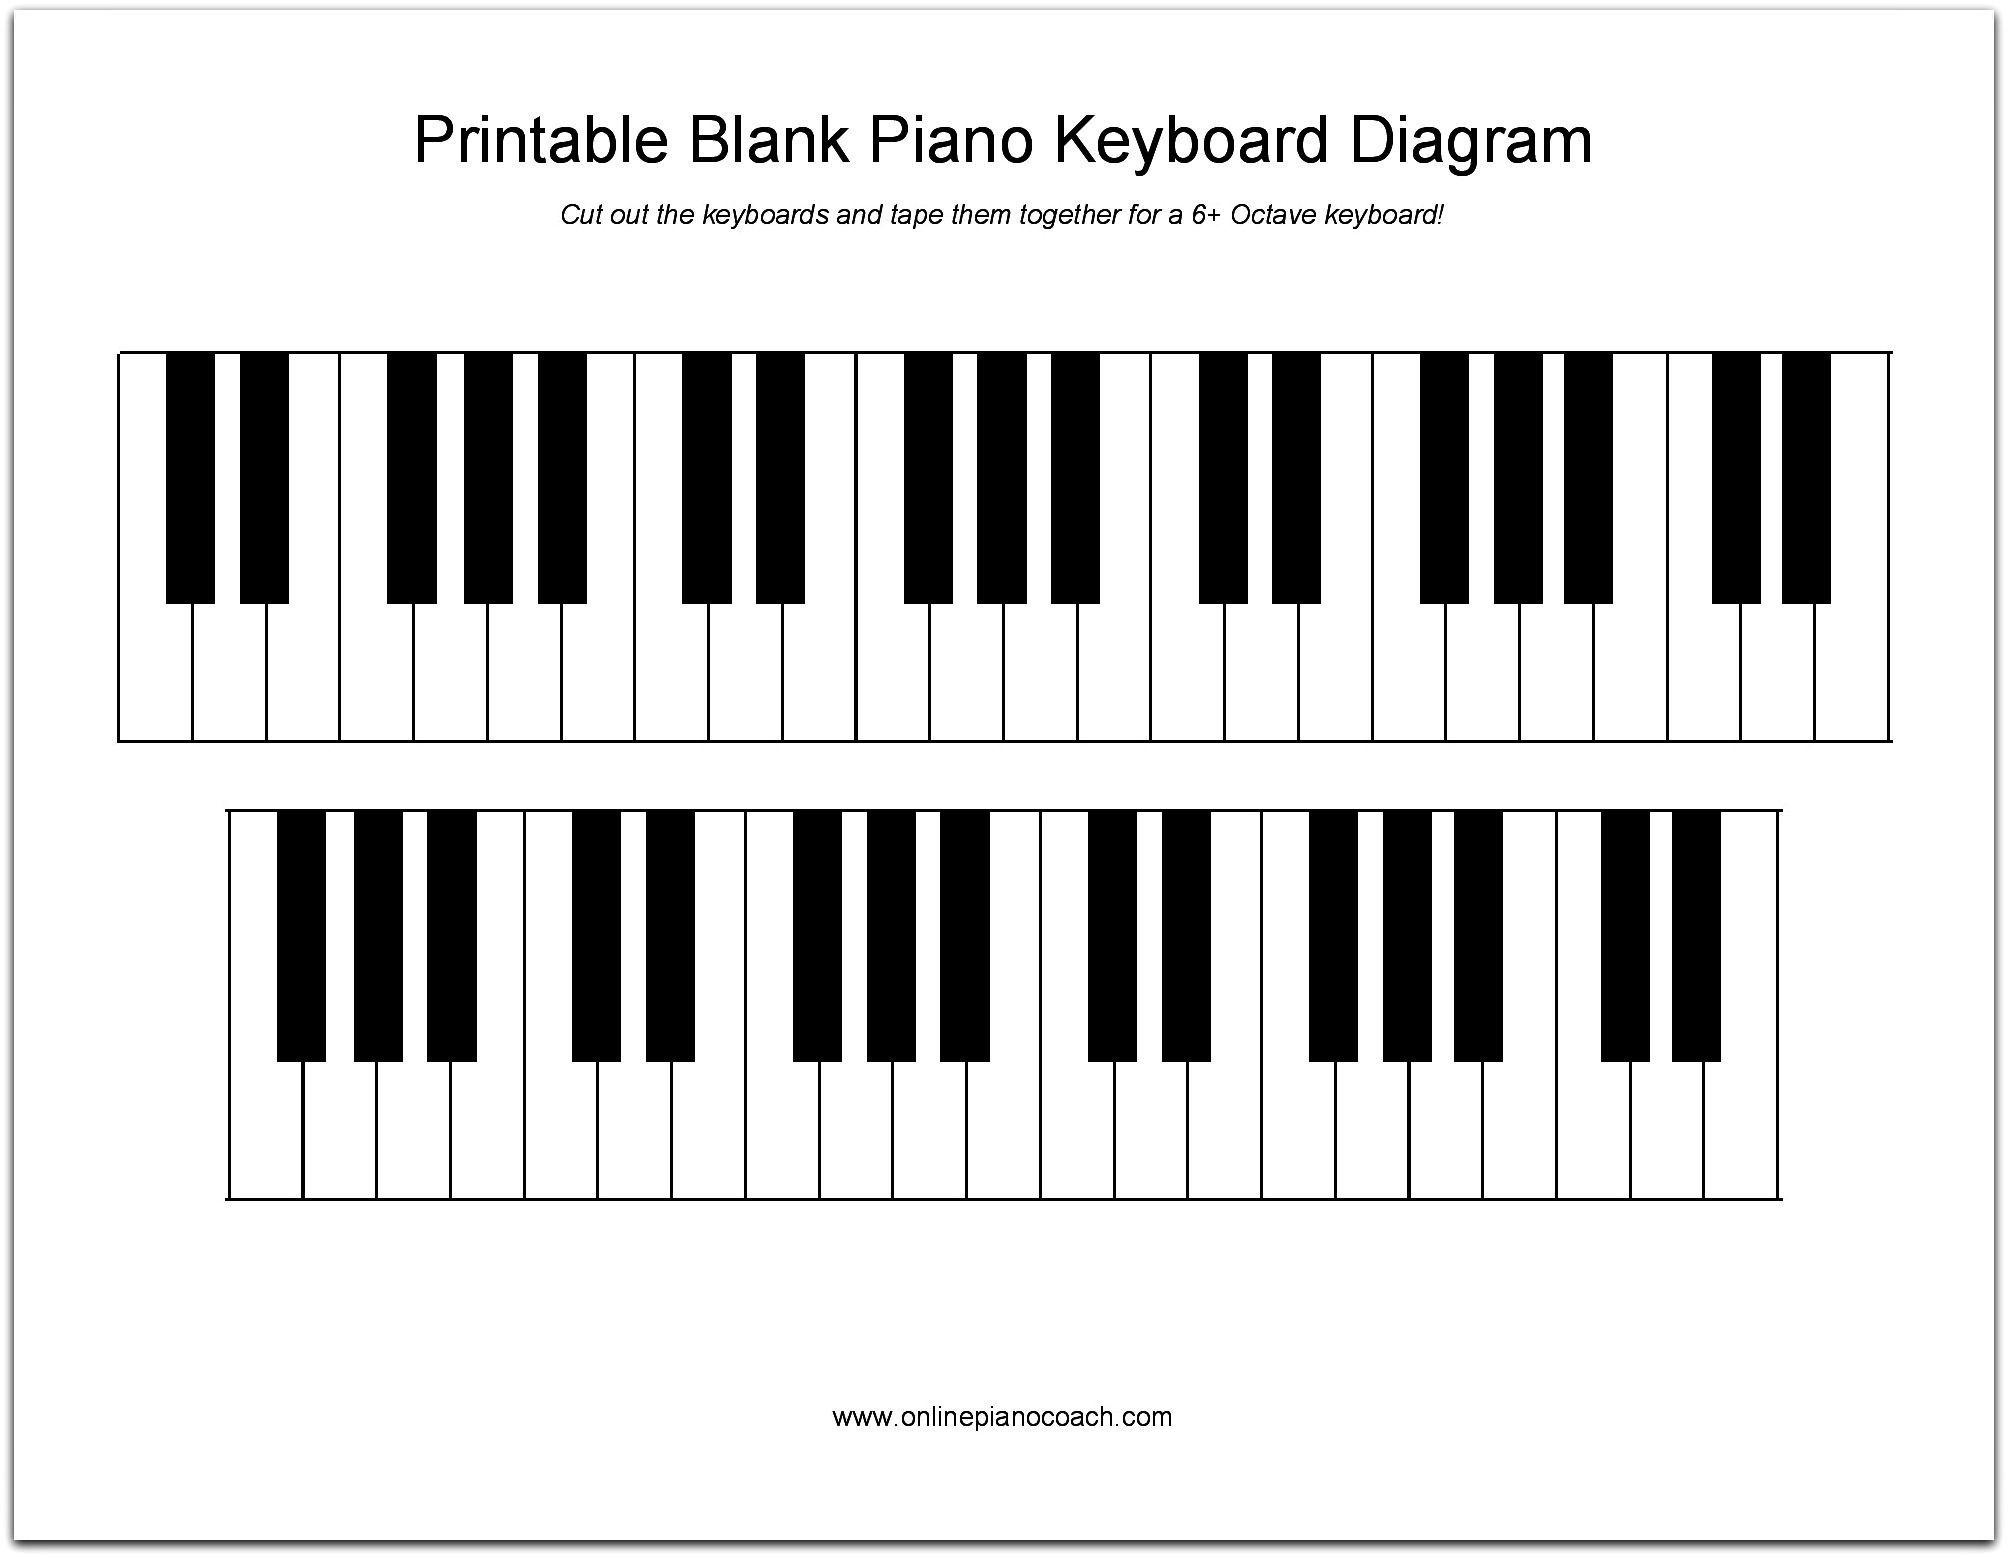 Printable Piano Keyboard Diagram In 2019 | Music | Piano, Easy Piano - Free Printable Keyboard Stickers